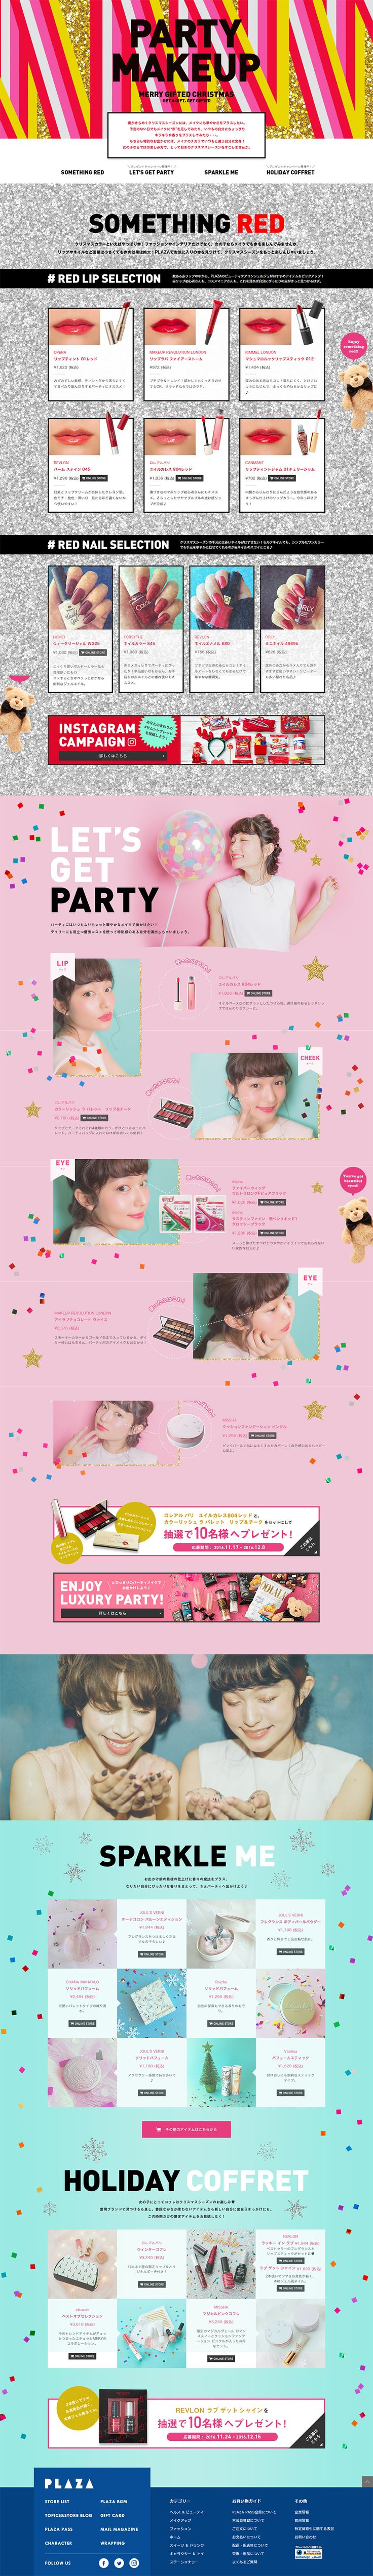 PARTY MAKEUP【スキンケア・美容商品関連】のLPデザイン。WEBデザイナーさん必見!ランディングページのデザイン参考に(派手系)